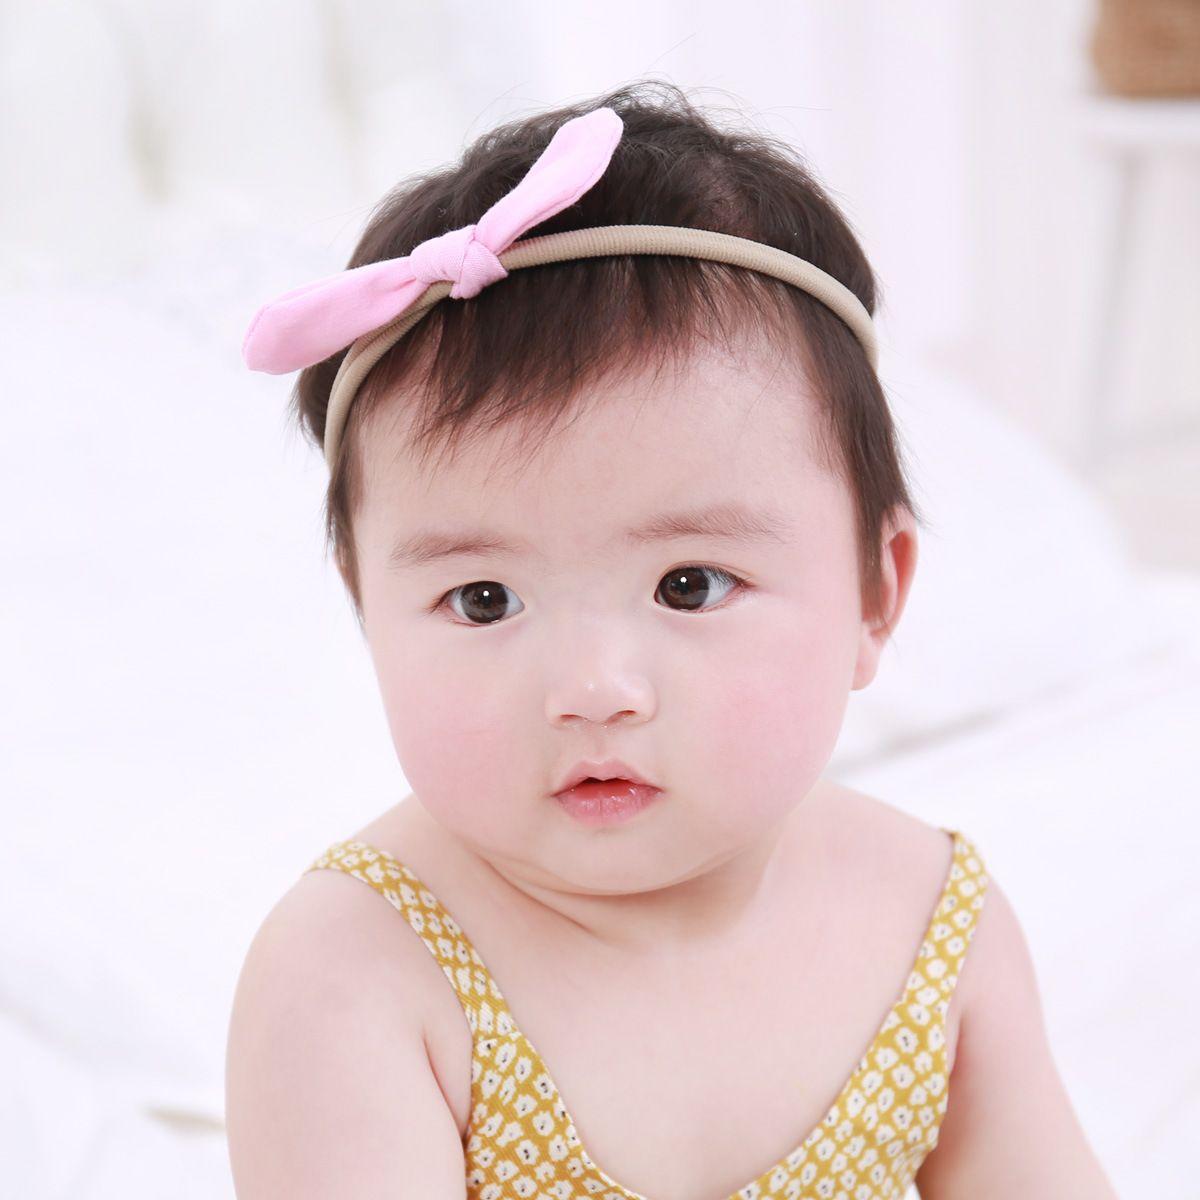 FAST SHIP!30 10CM Newborn Baby Bunny Ear Elastic Headband Bowknot ... 0c116d5f2e4